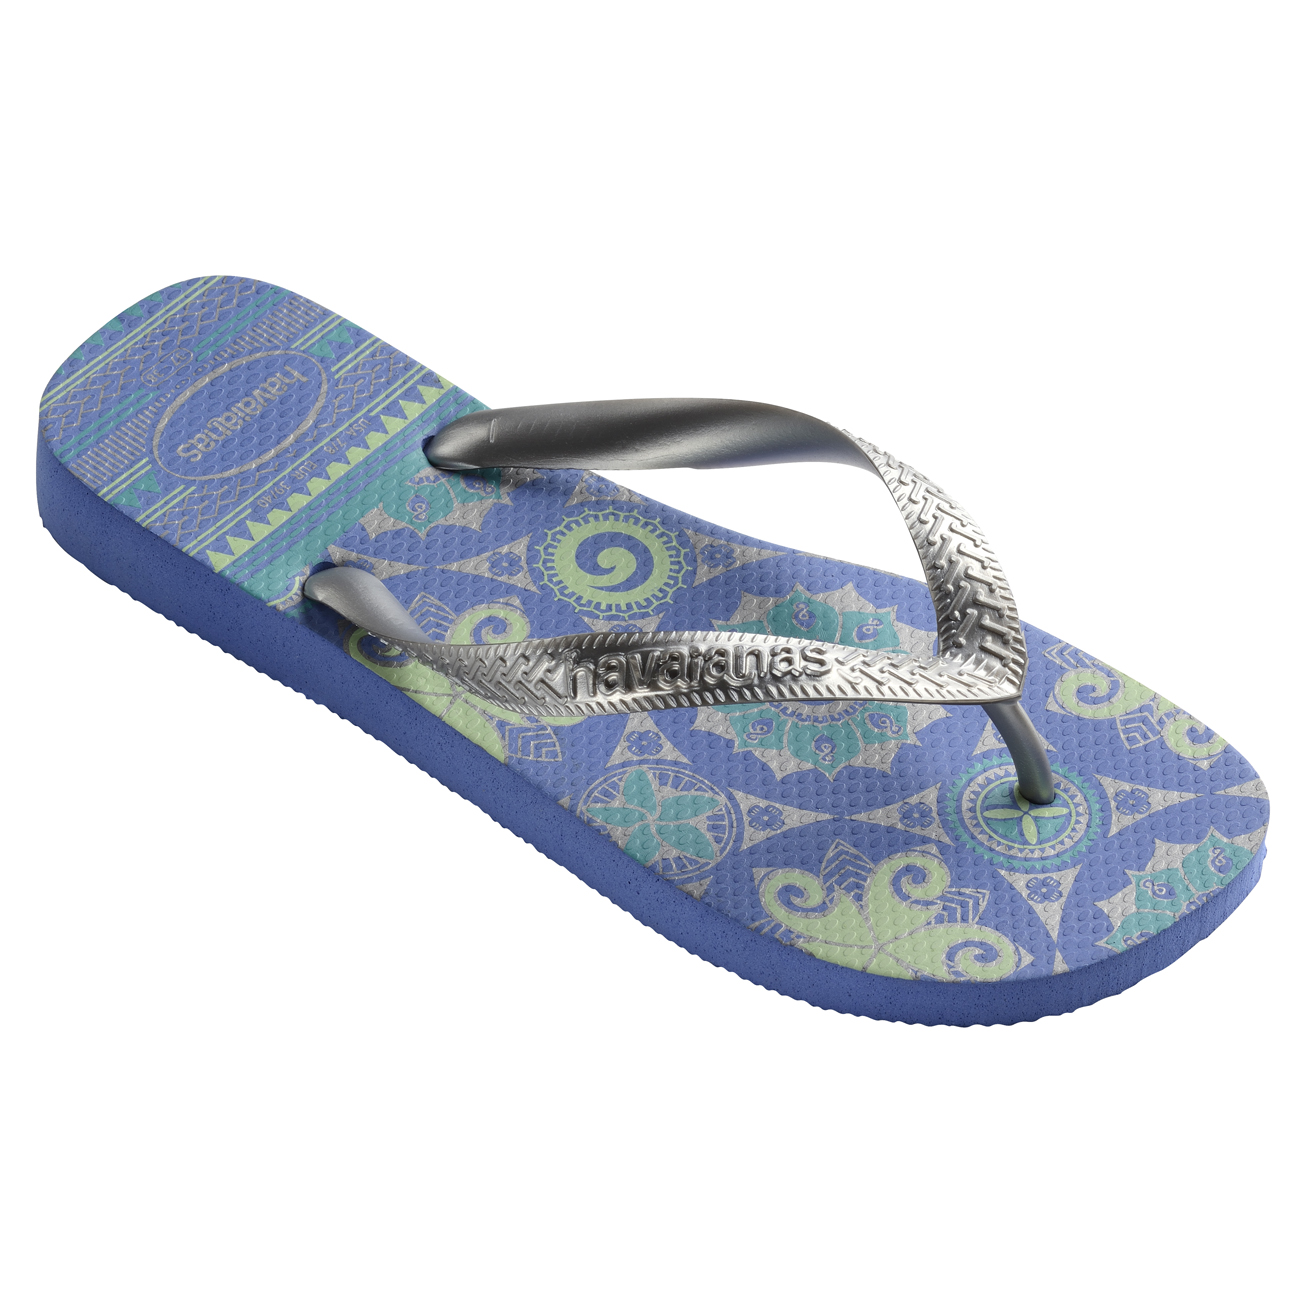 c5ed8c86a2225 Ladies Havaianas Spring Sandal Beach Thong Toe Post Holiday Flip ...